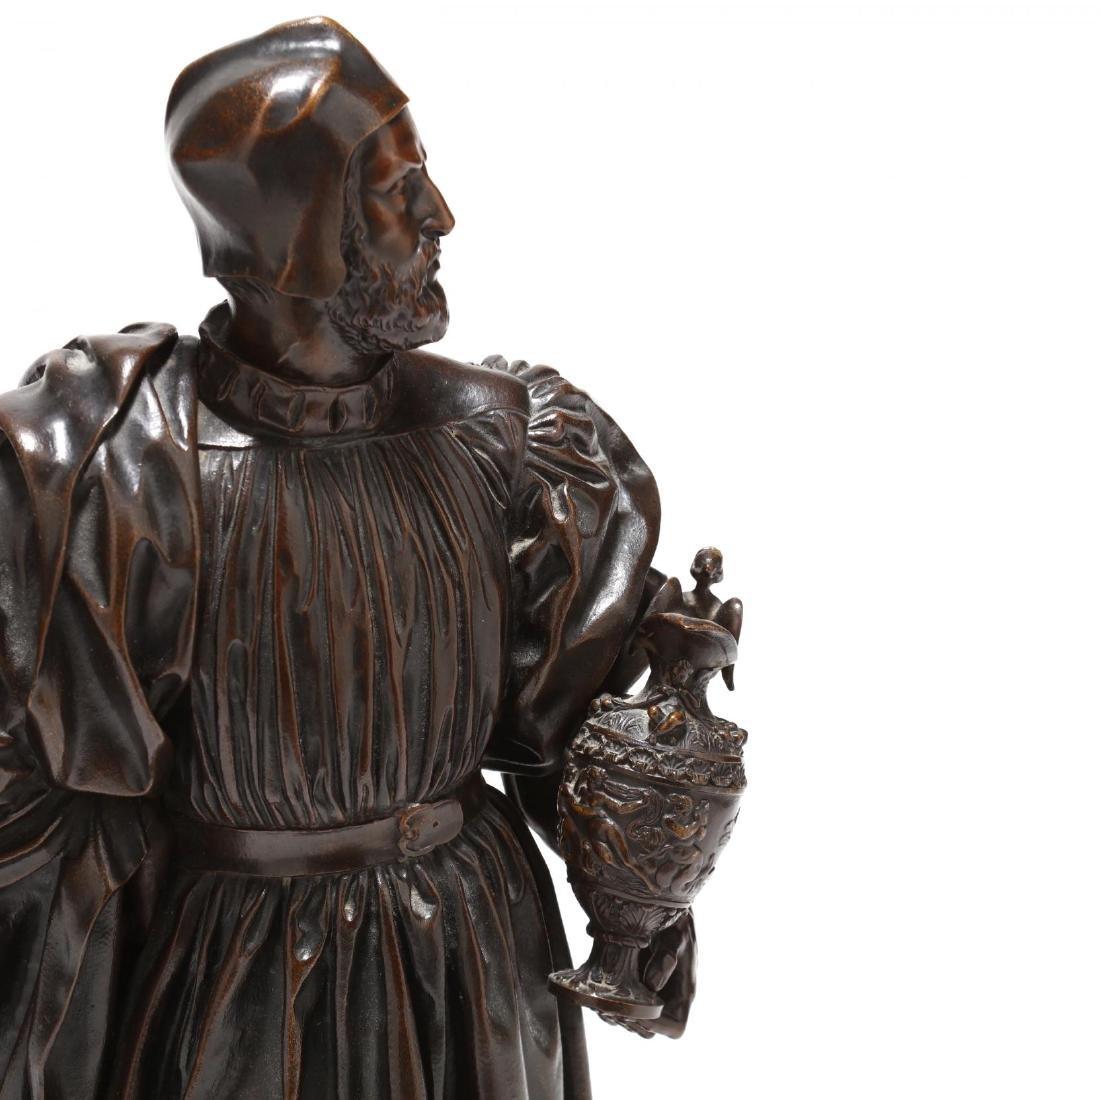 Antique Bronze Sculpture of a Renaissance Man - 3